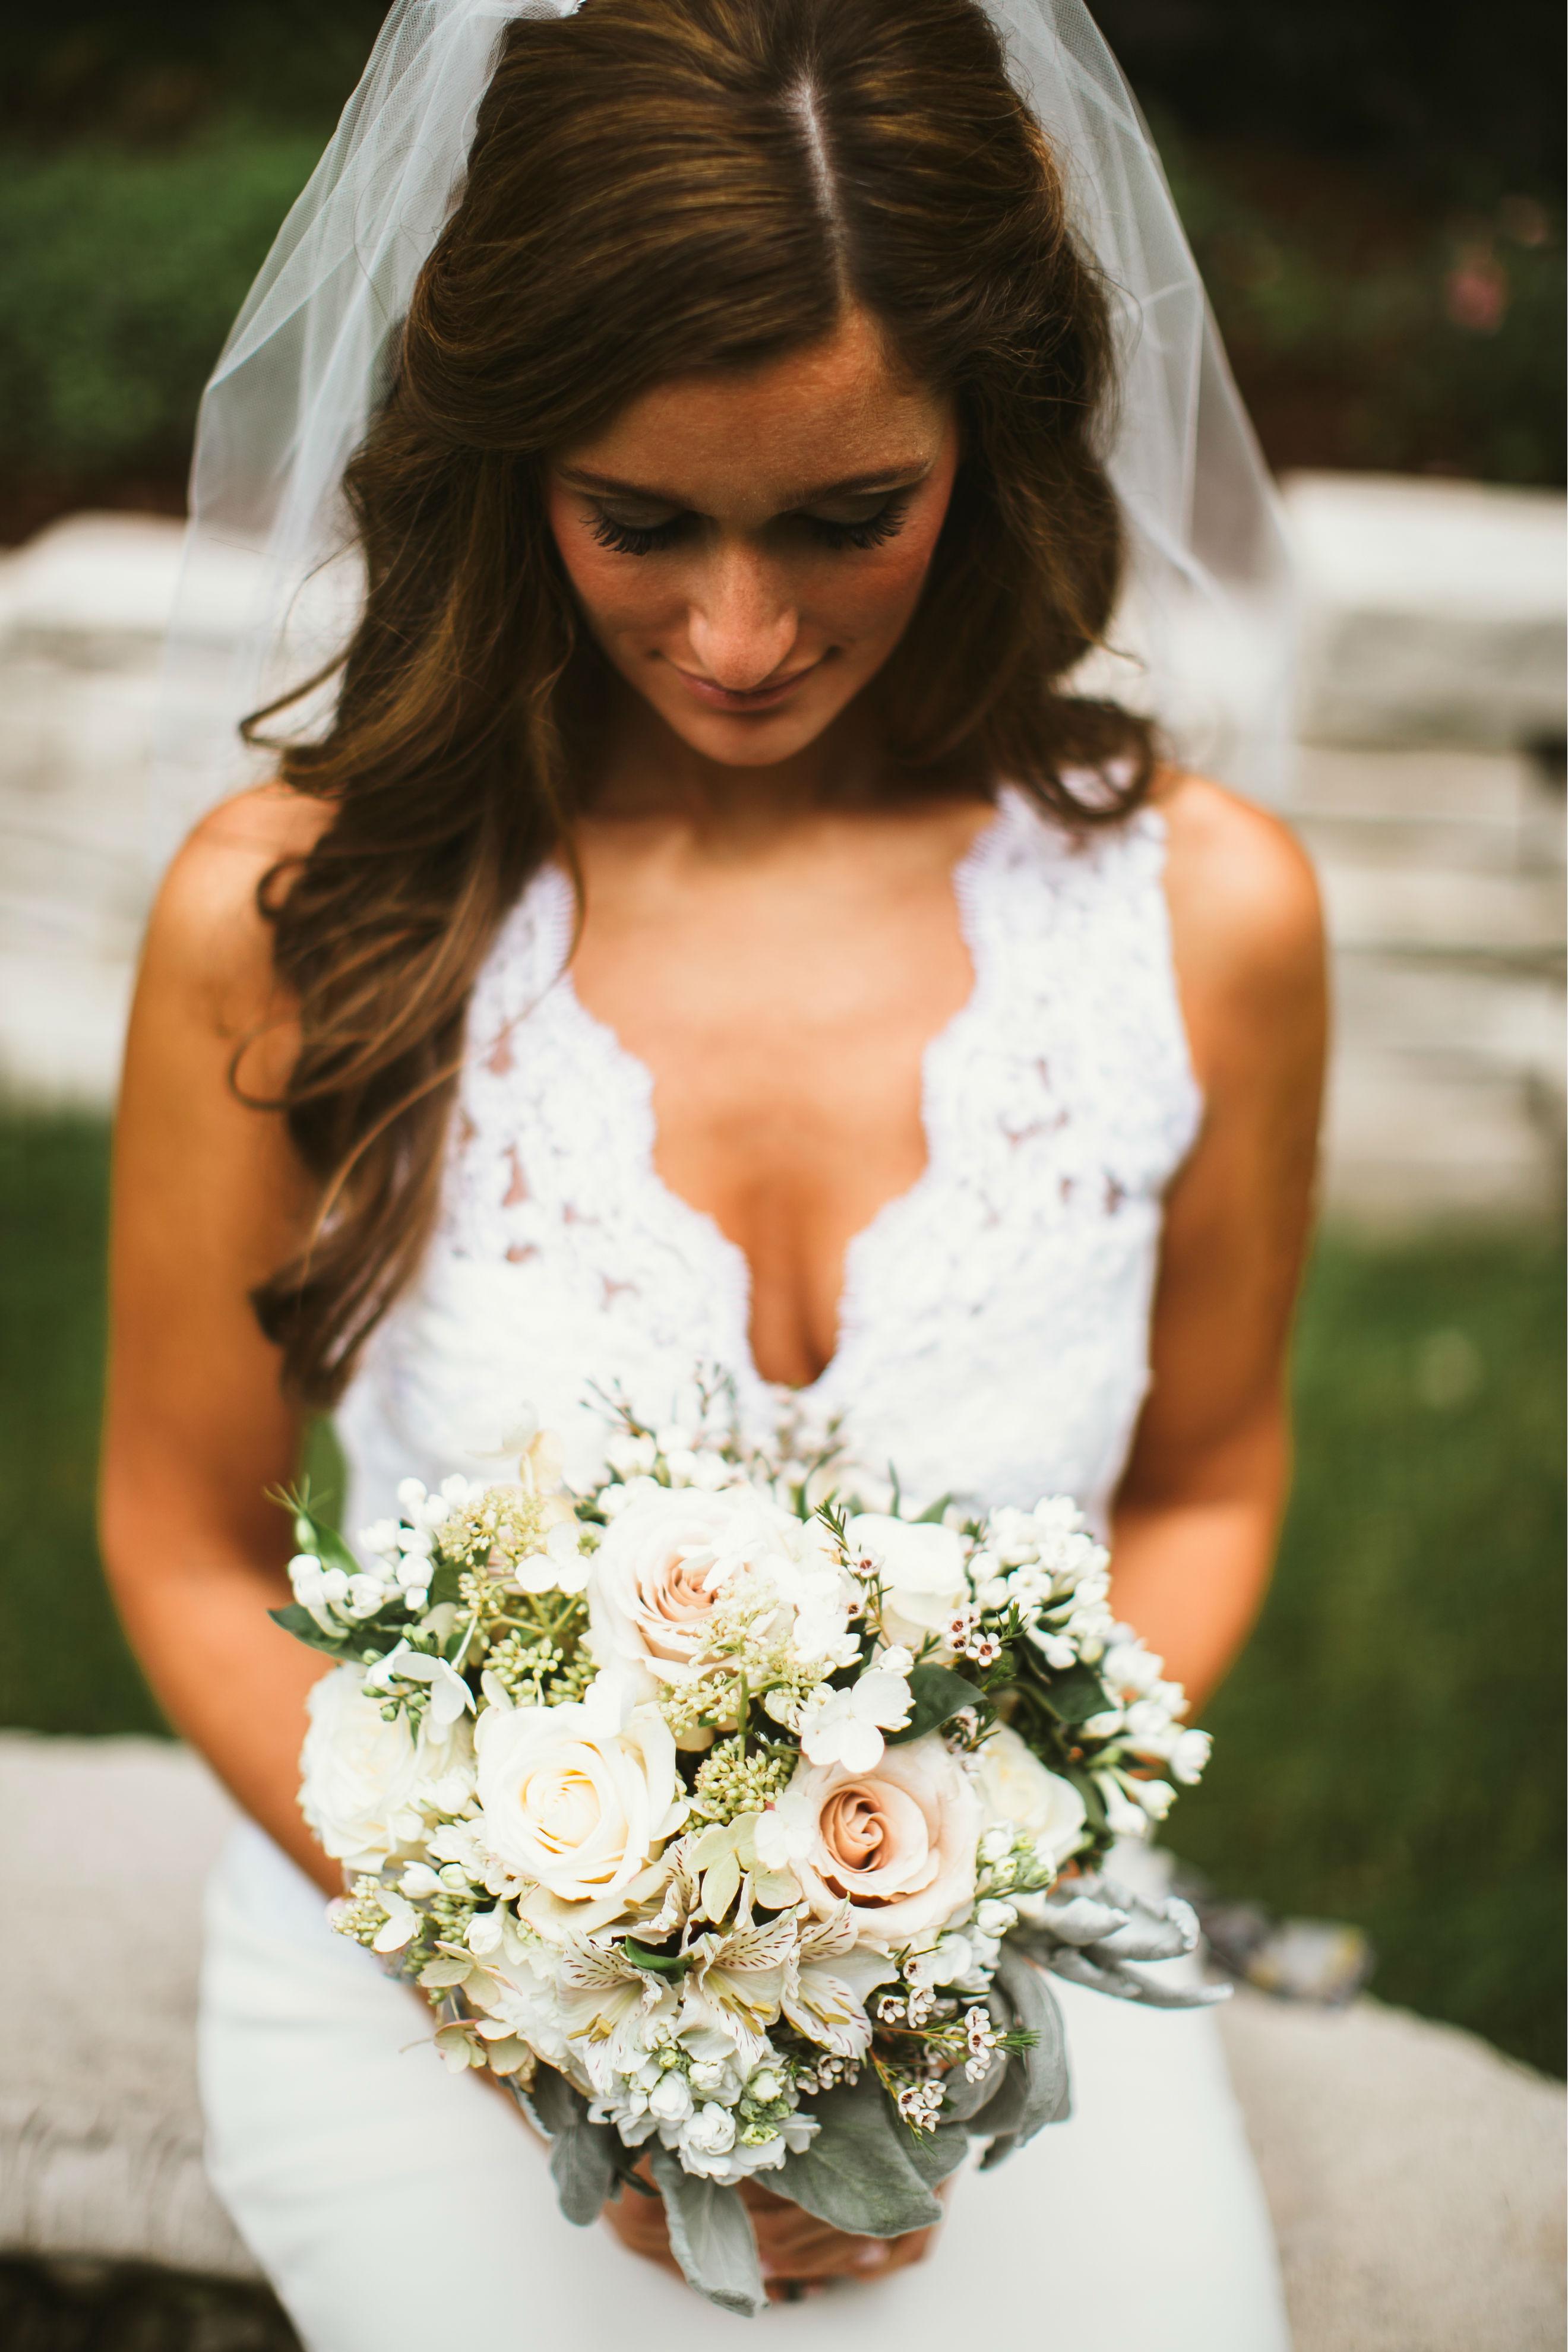 Artquest, Ltd. bridal bouquet design.